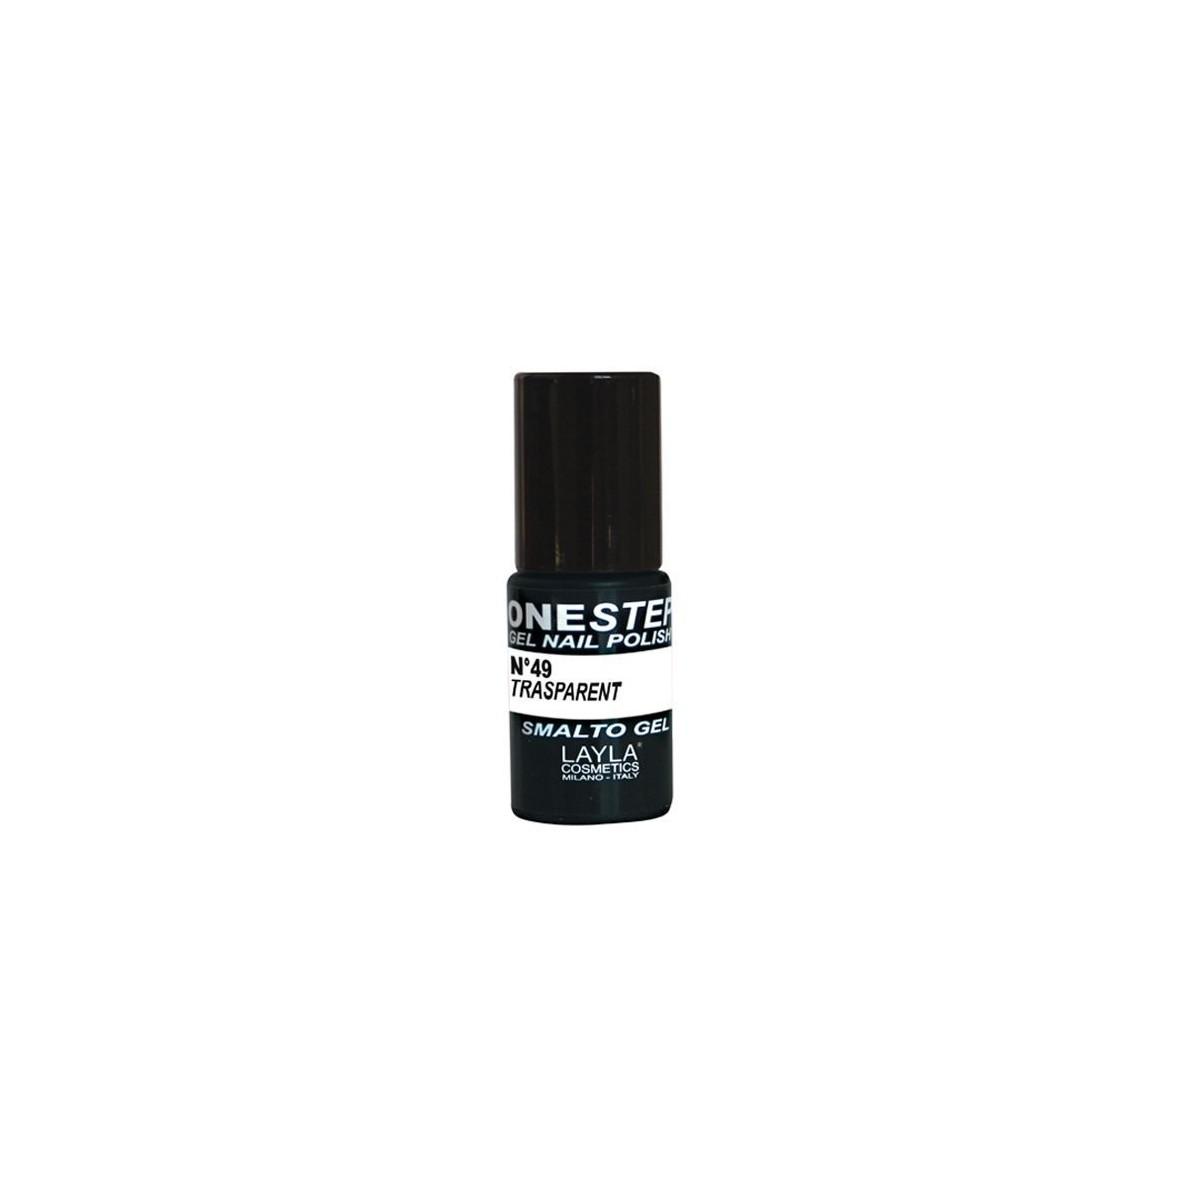 Vernis à ongles Transparent UV Gel One-step Layla 1